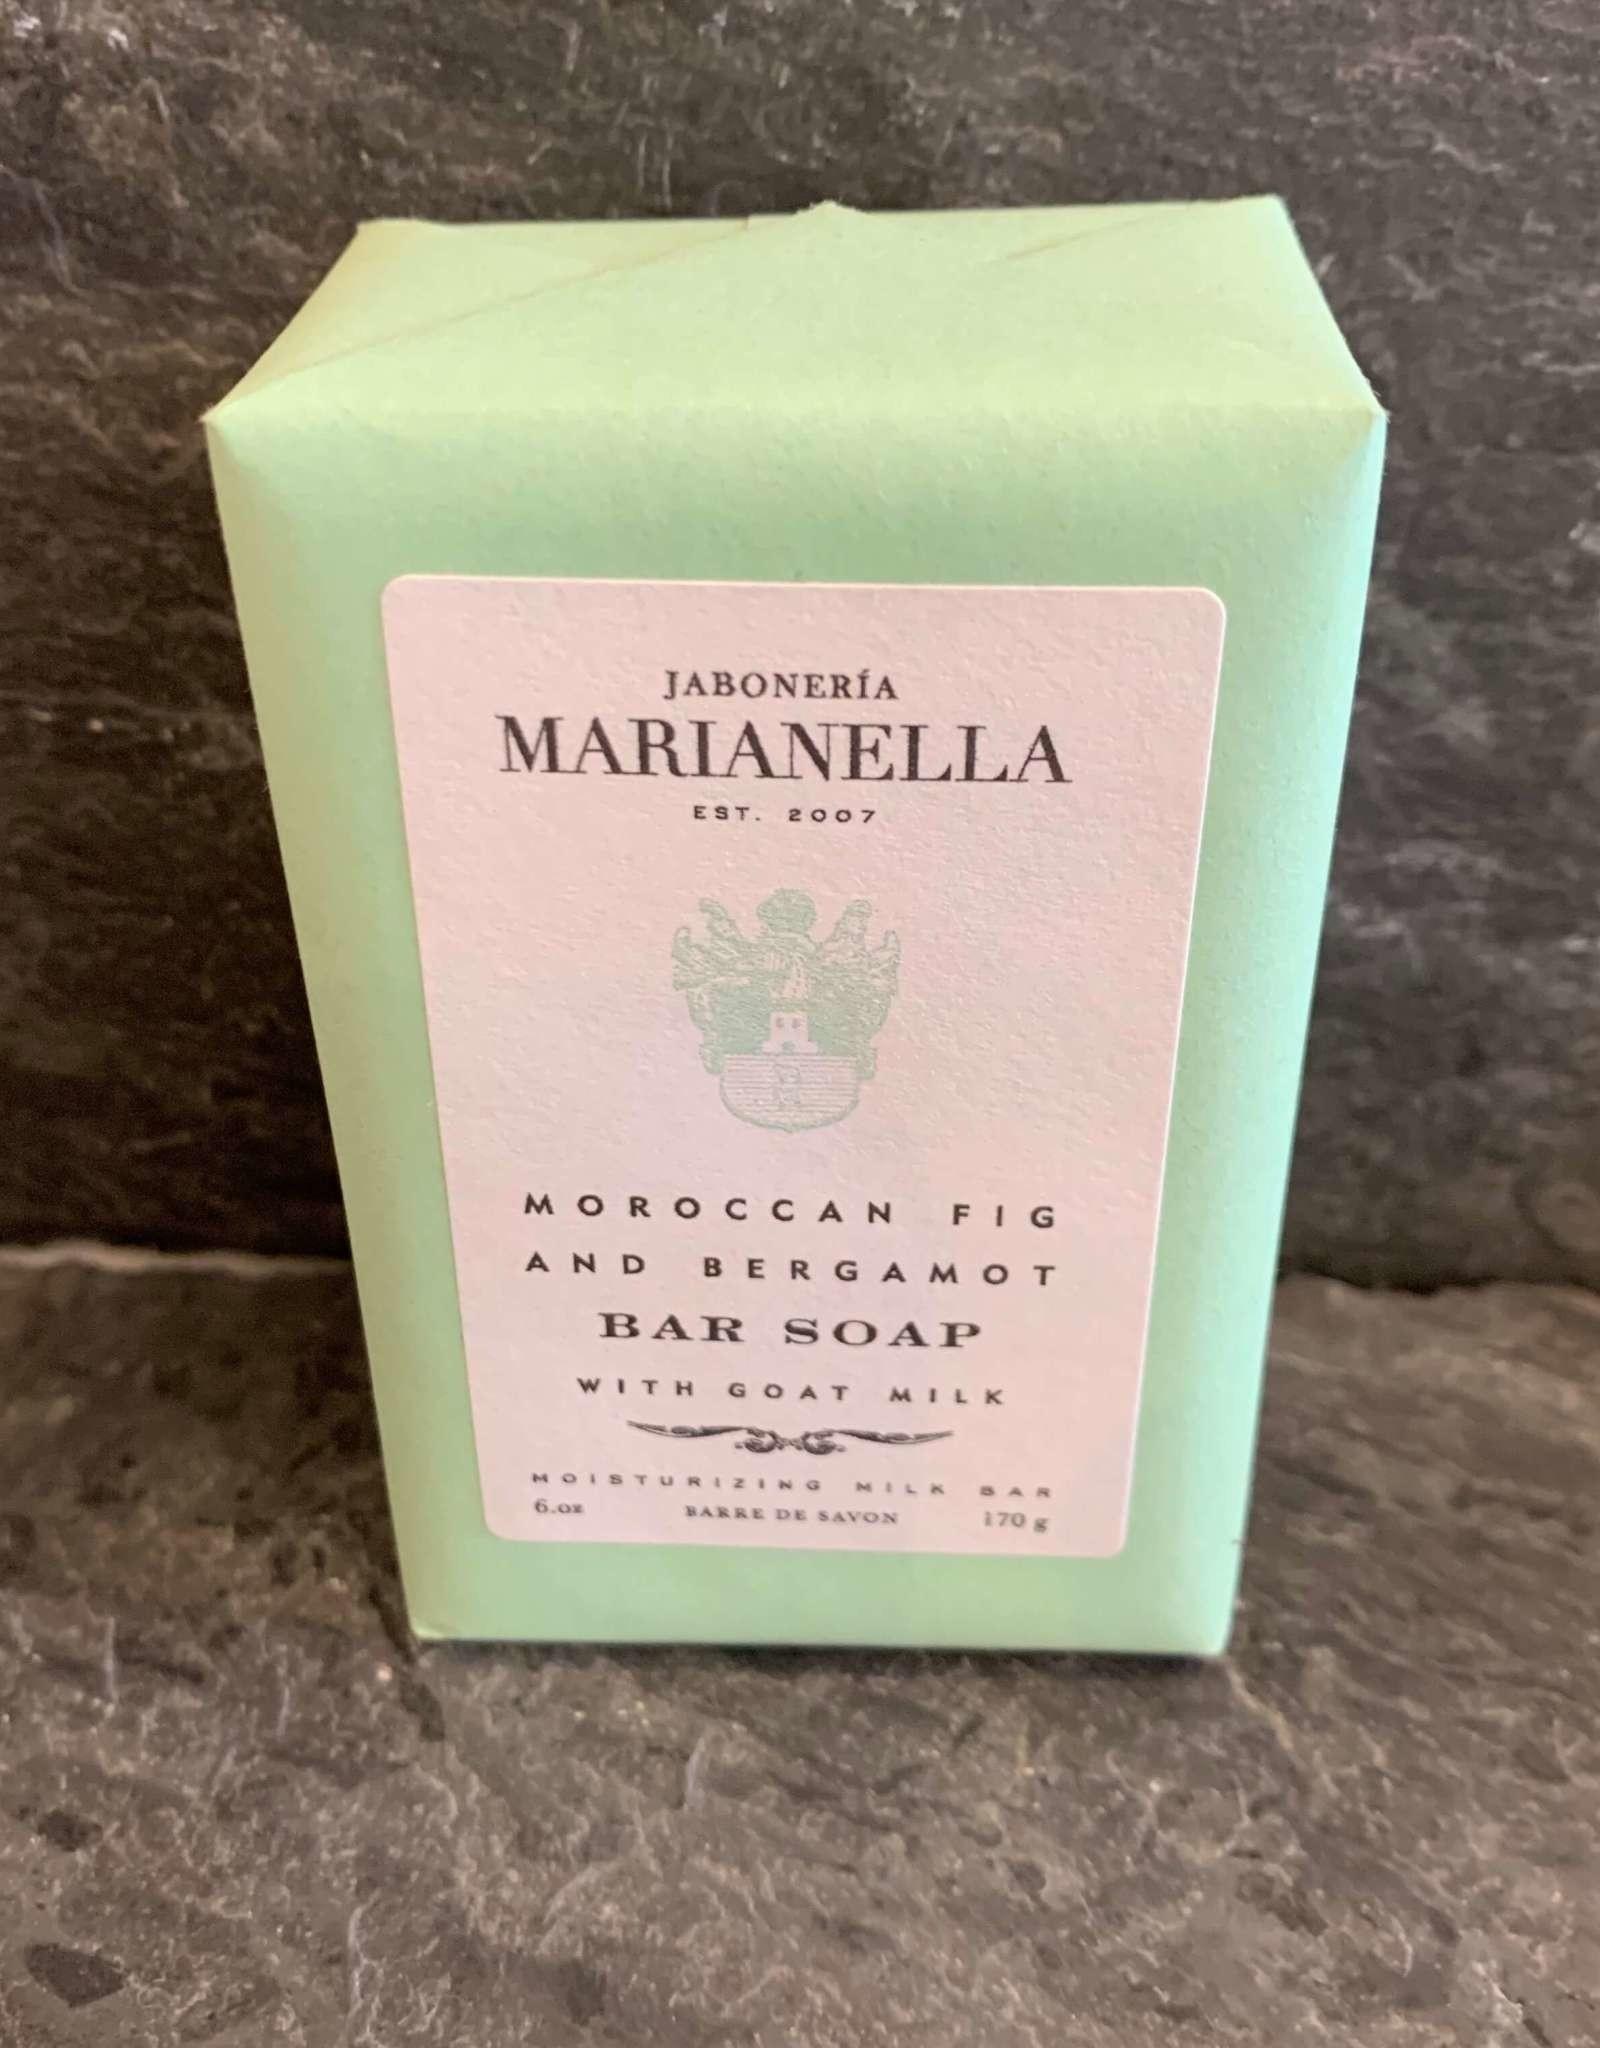 Marianella Jaboneria Marianella Moroccan Fig & Bergamot Soap Bar